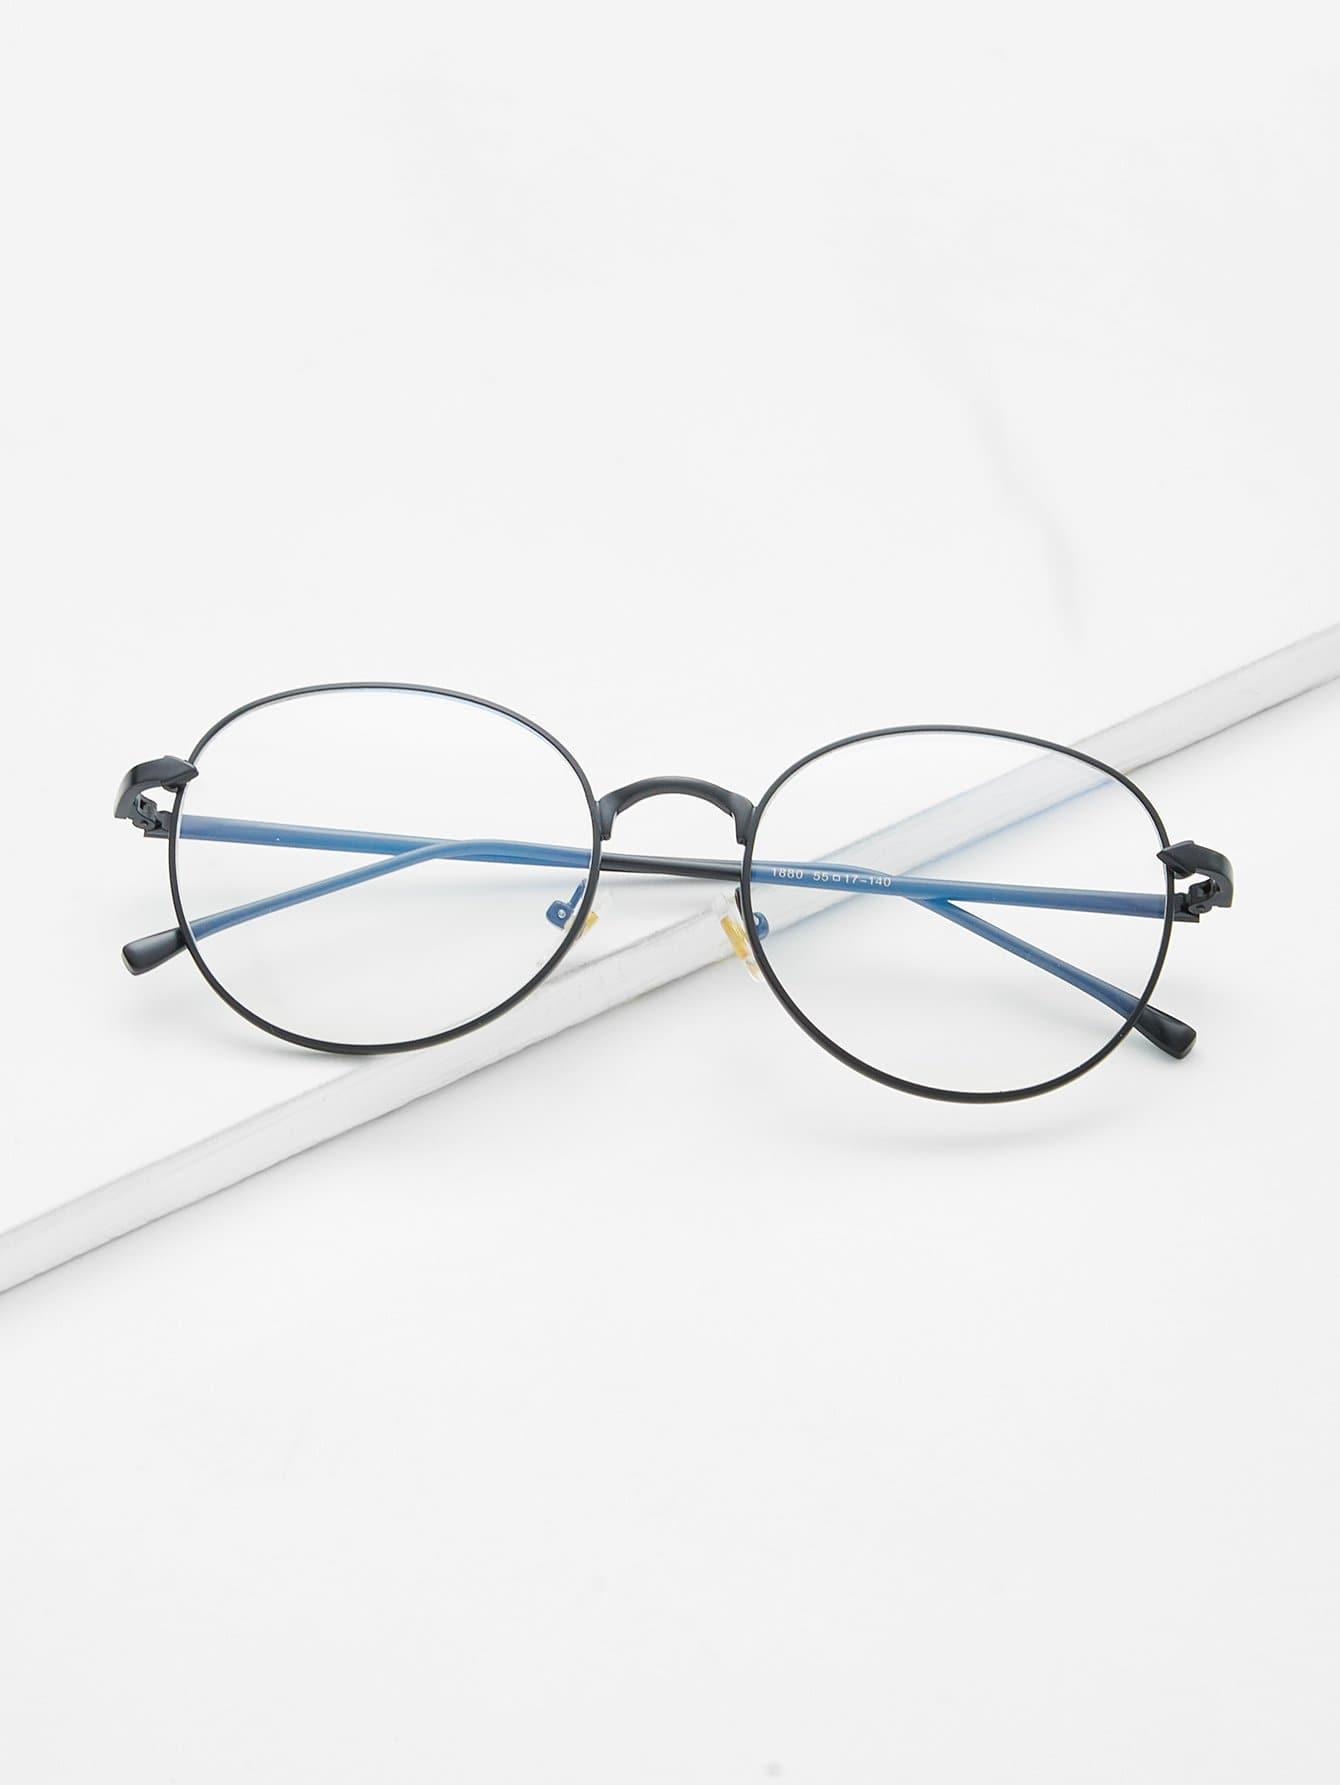 Metal Frame Clear Lens Glasses clear frame cat eye glasses